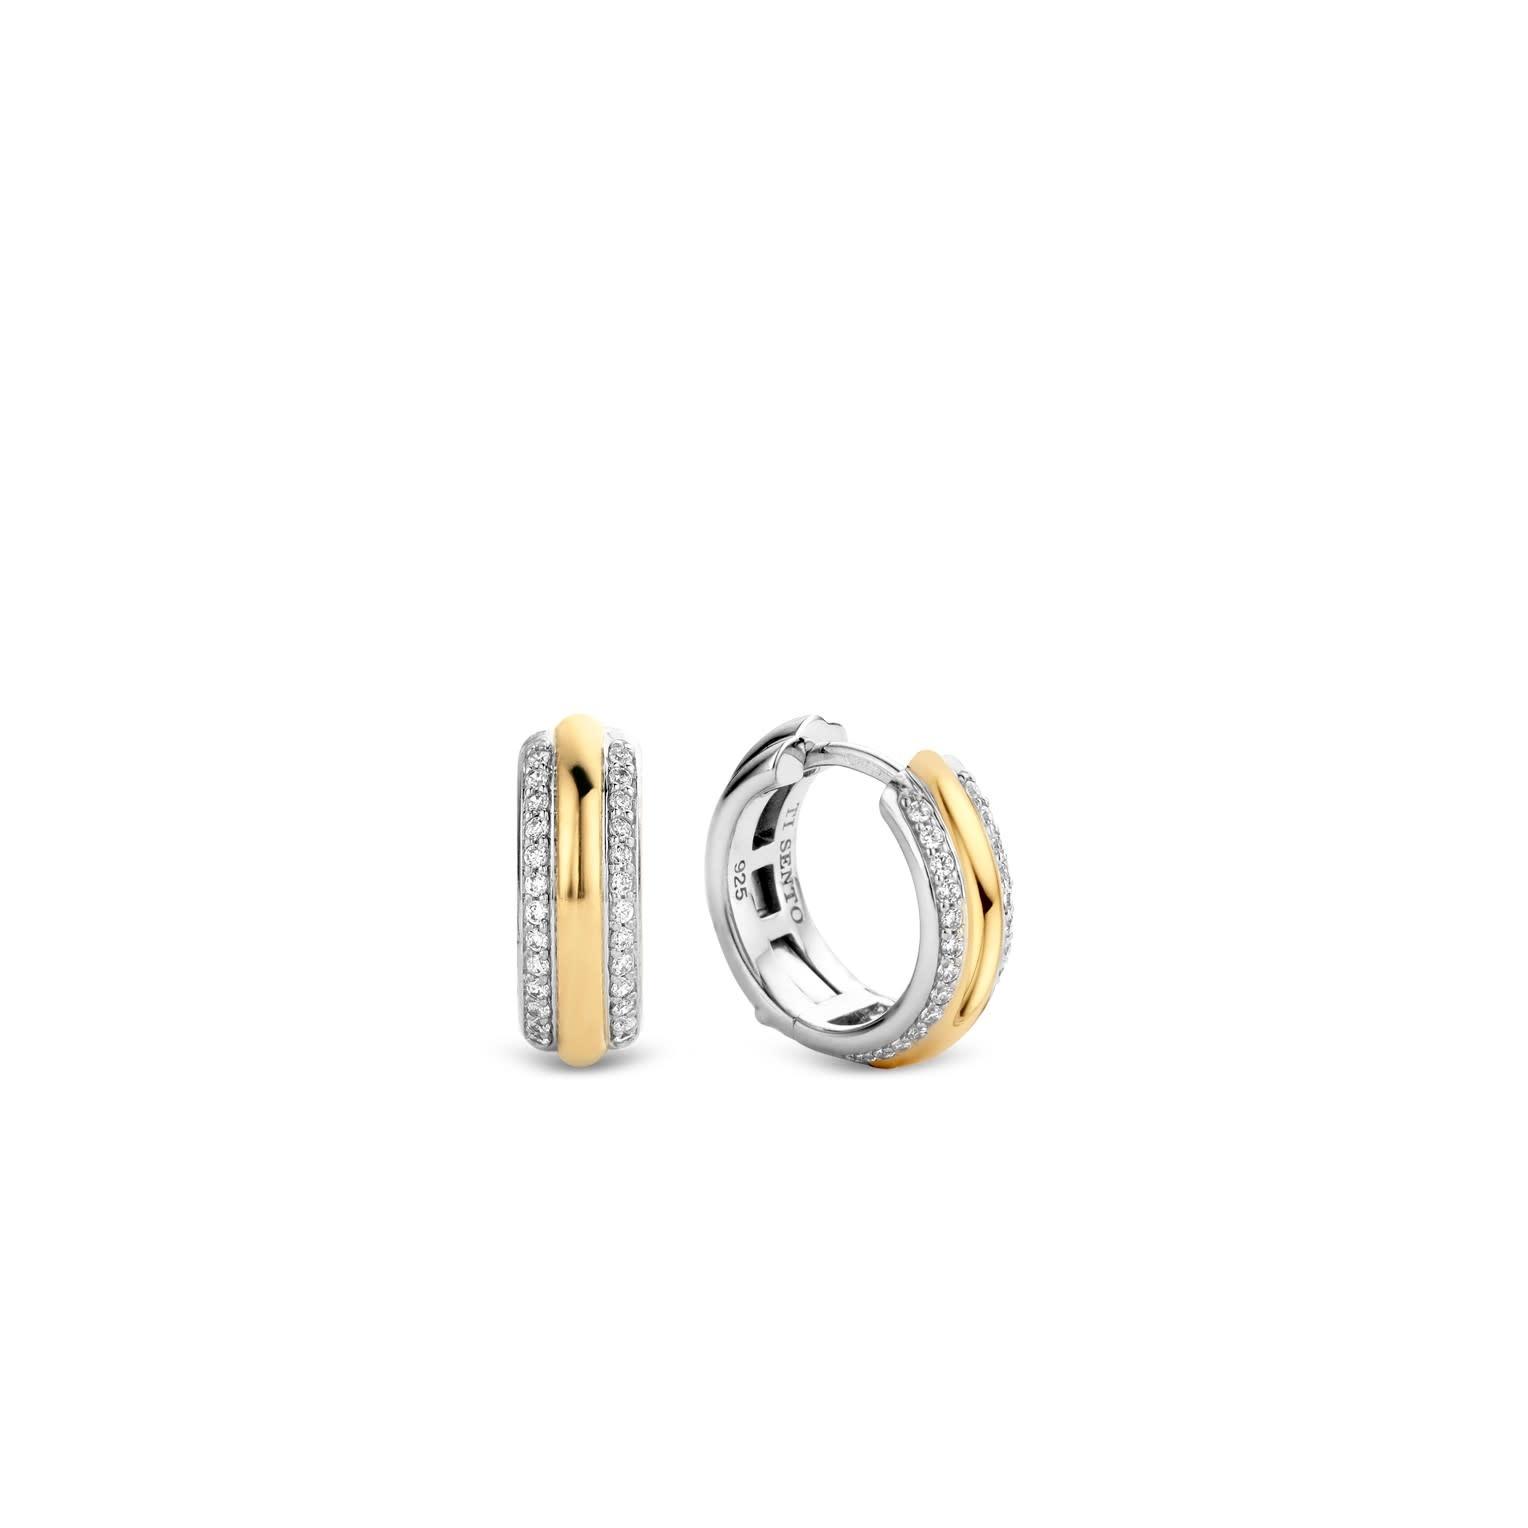 TI SENTO - Milano Earrings 7786ZY-1